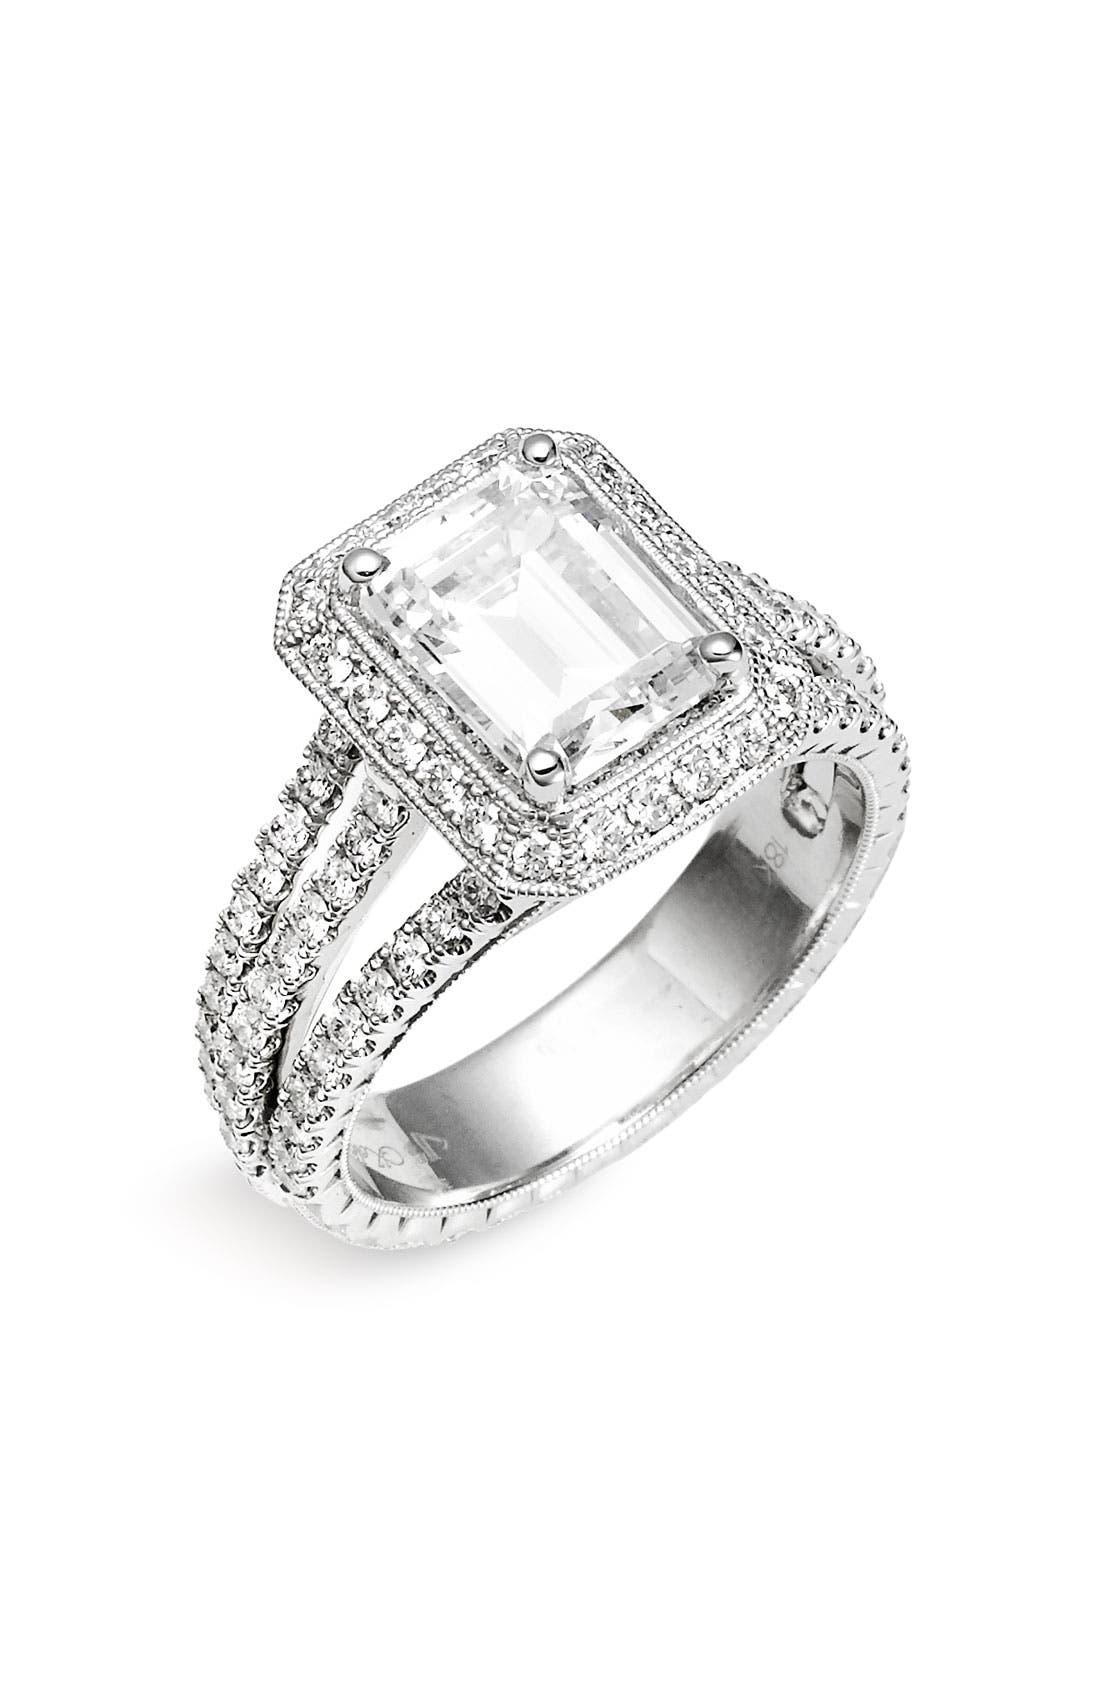 Main Image - Jack Kelége 'Romance' Emerald Cut Diamond Engagement Ring Setting